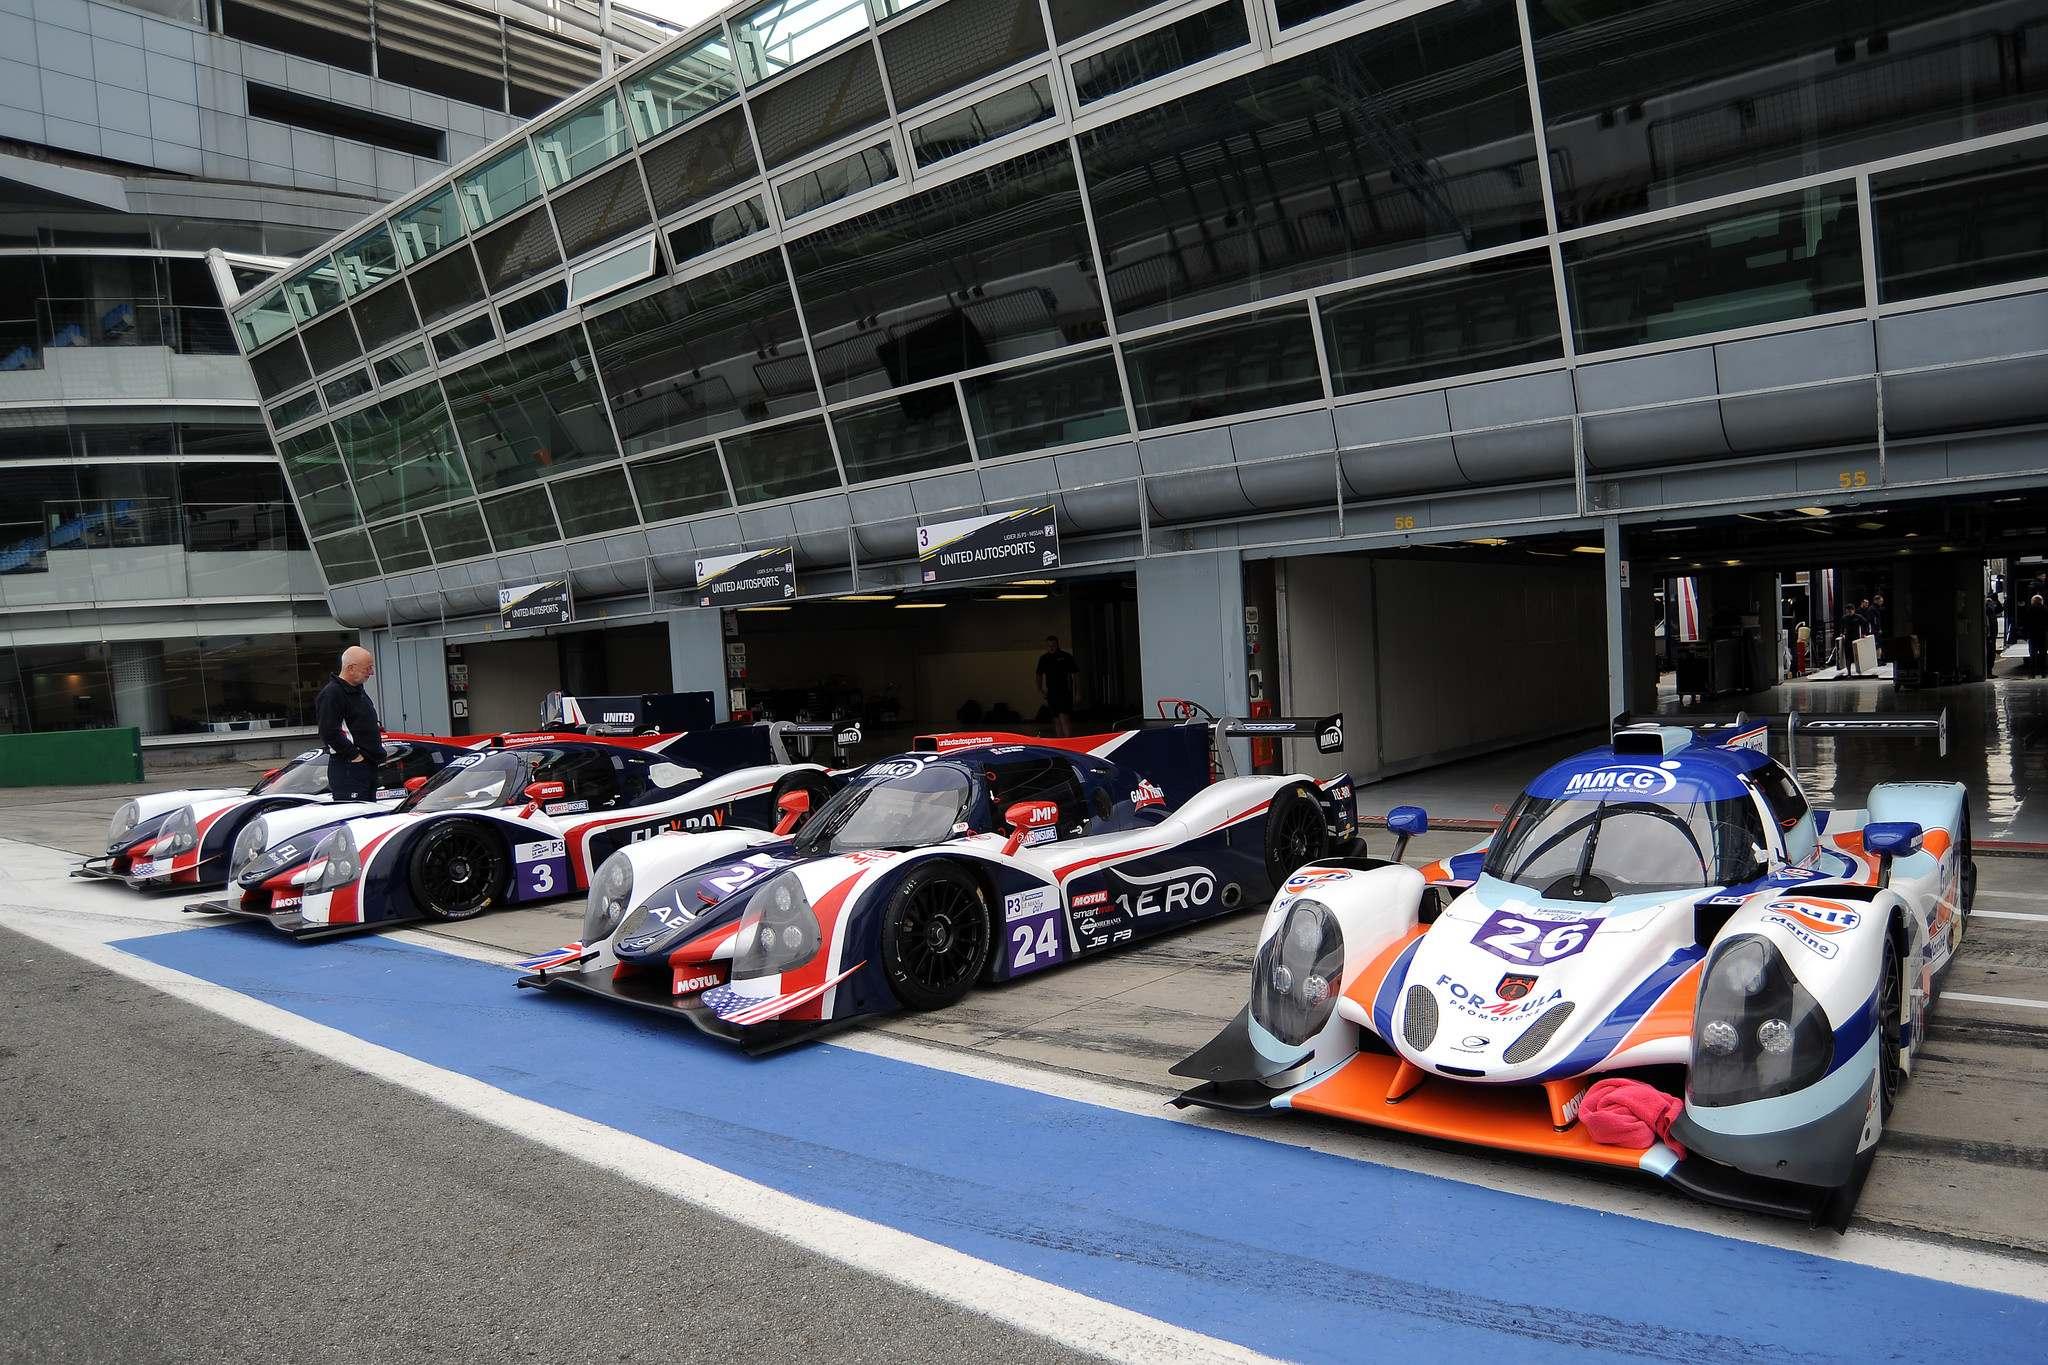 unitedautosports9 United Autosports in Monza